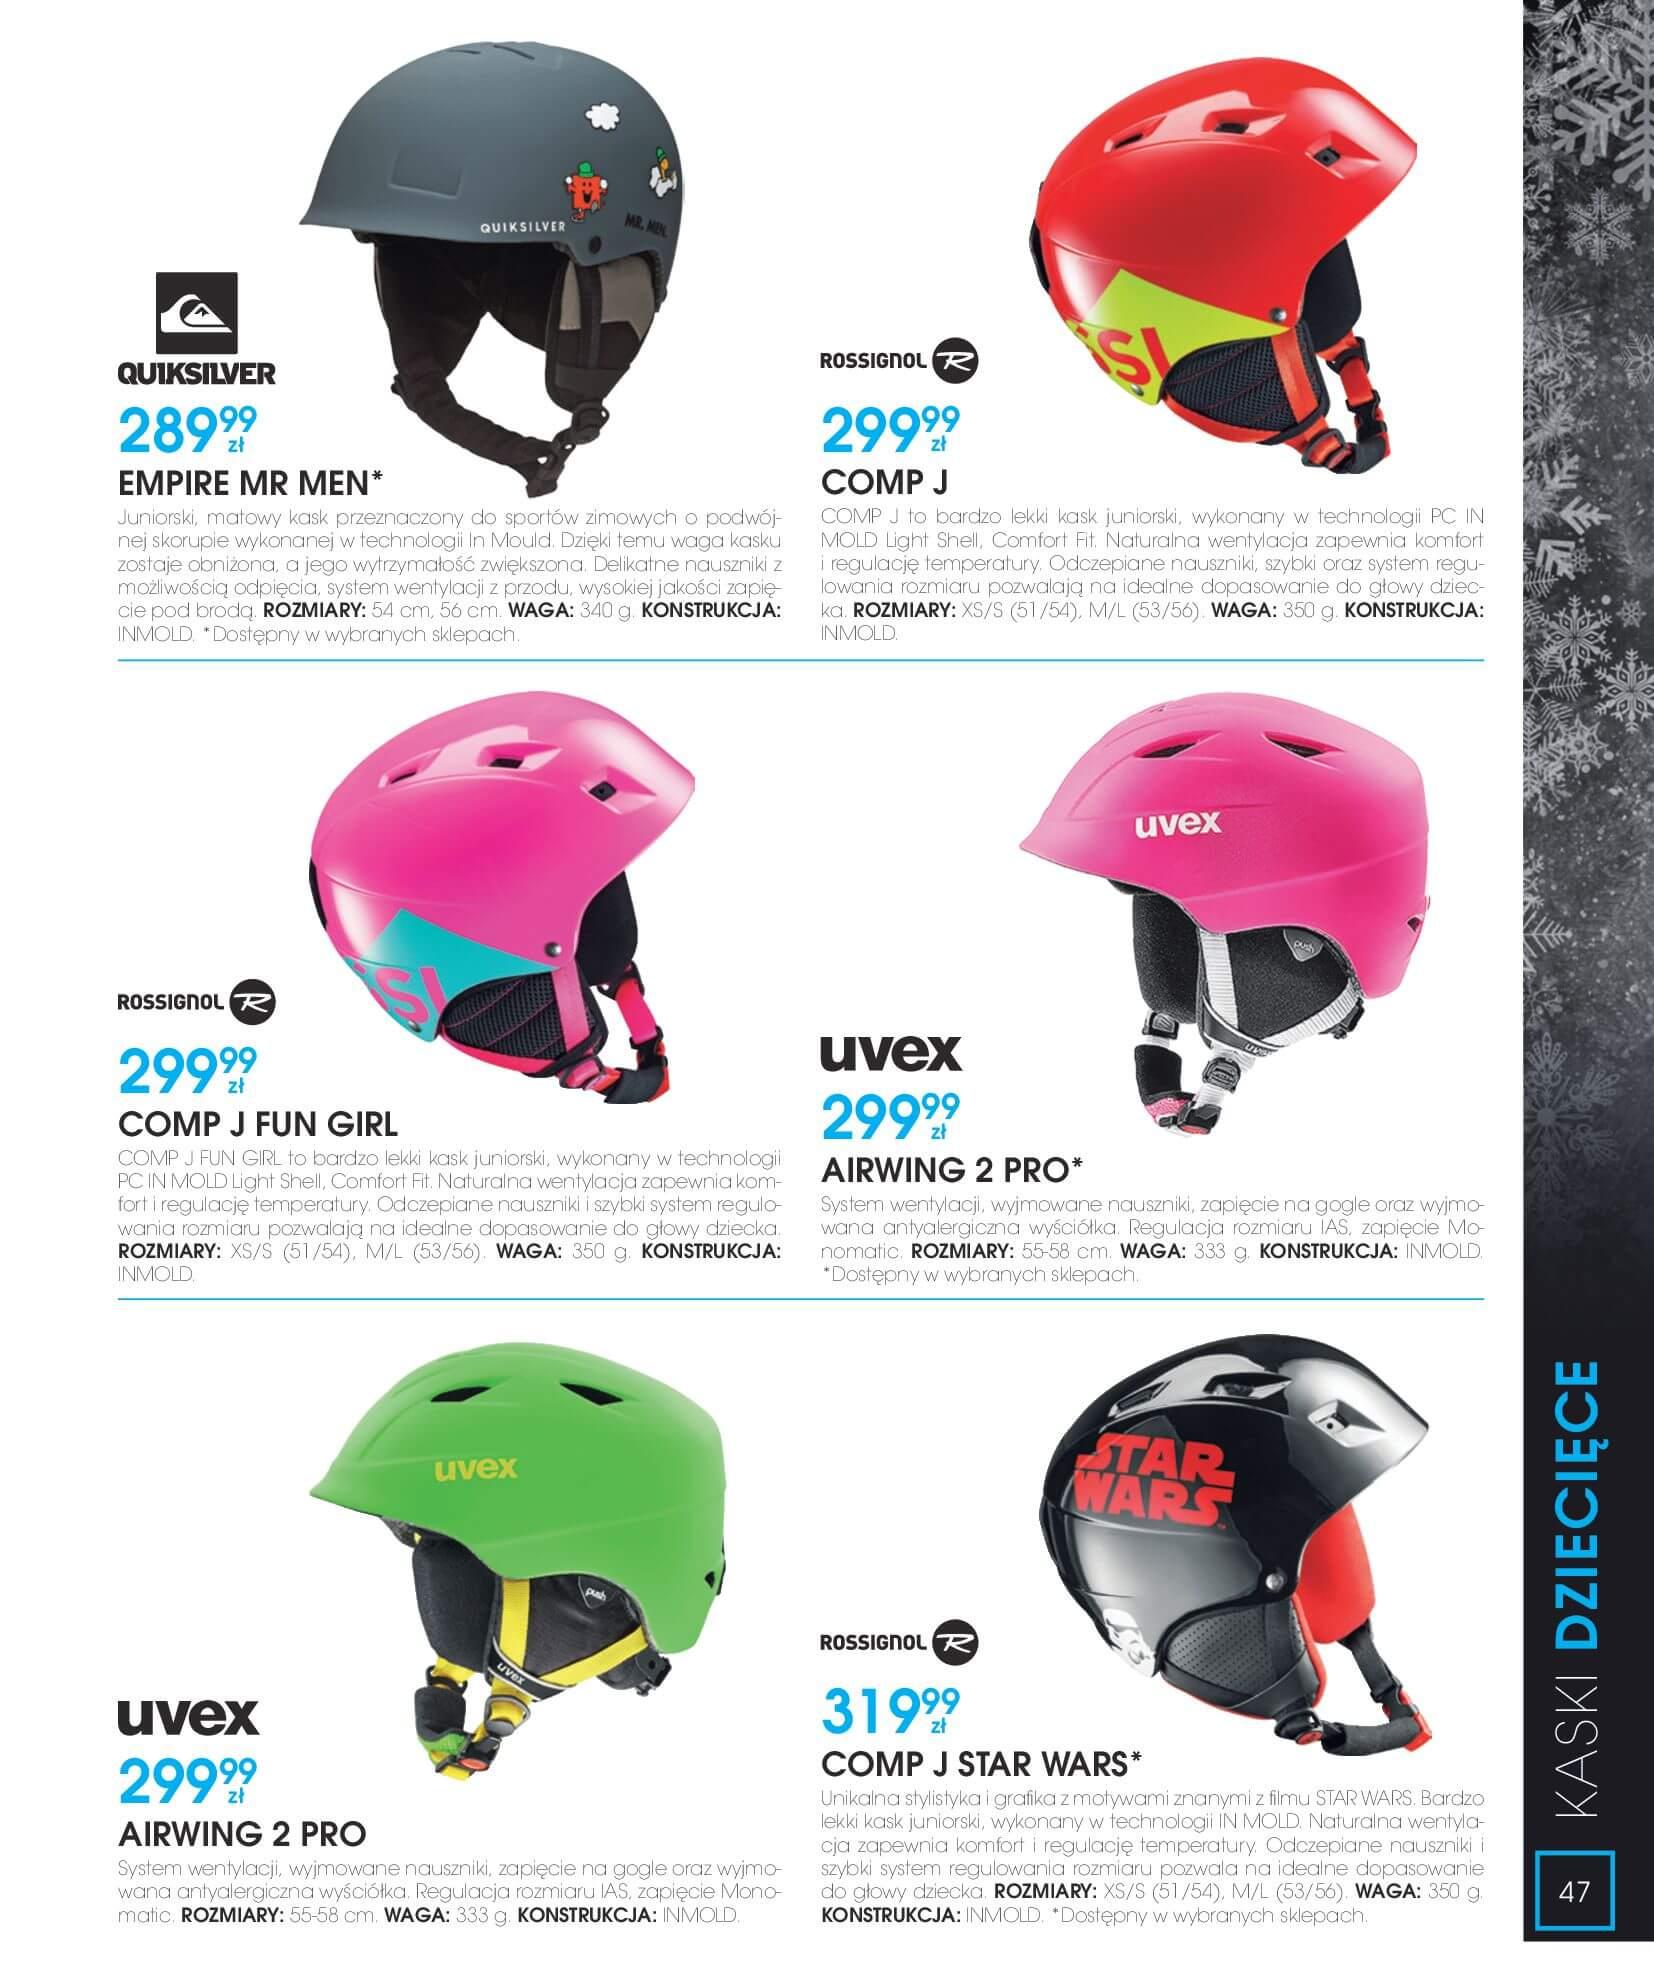 Gazetka Go Sport - Katalog Zima 2017/2018-12.11.2017-28.02.2018-page-47